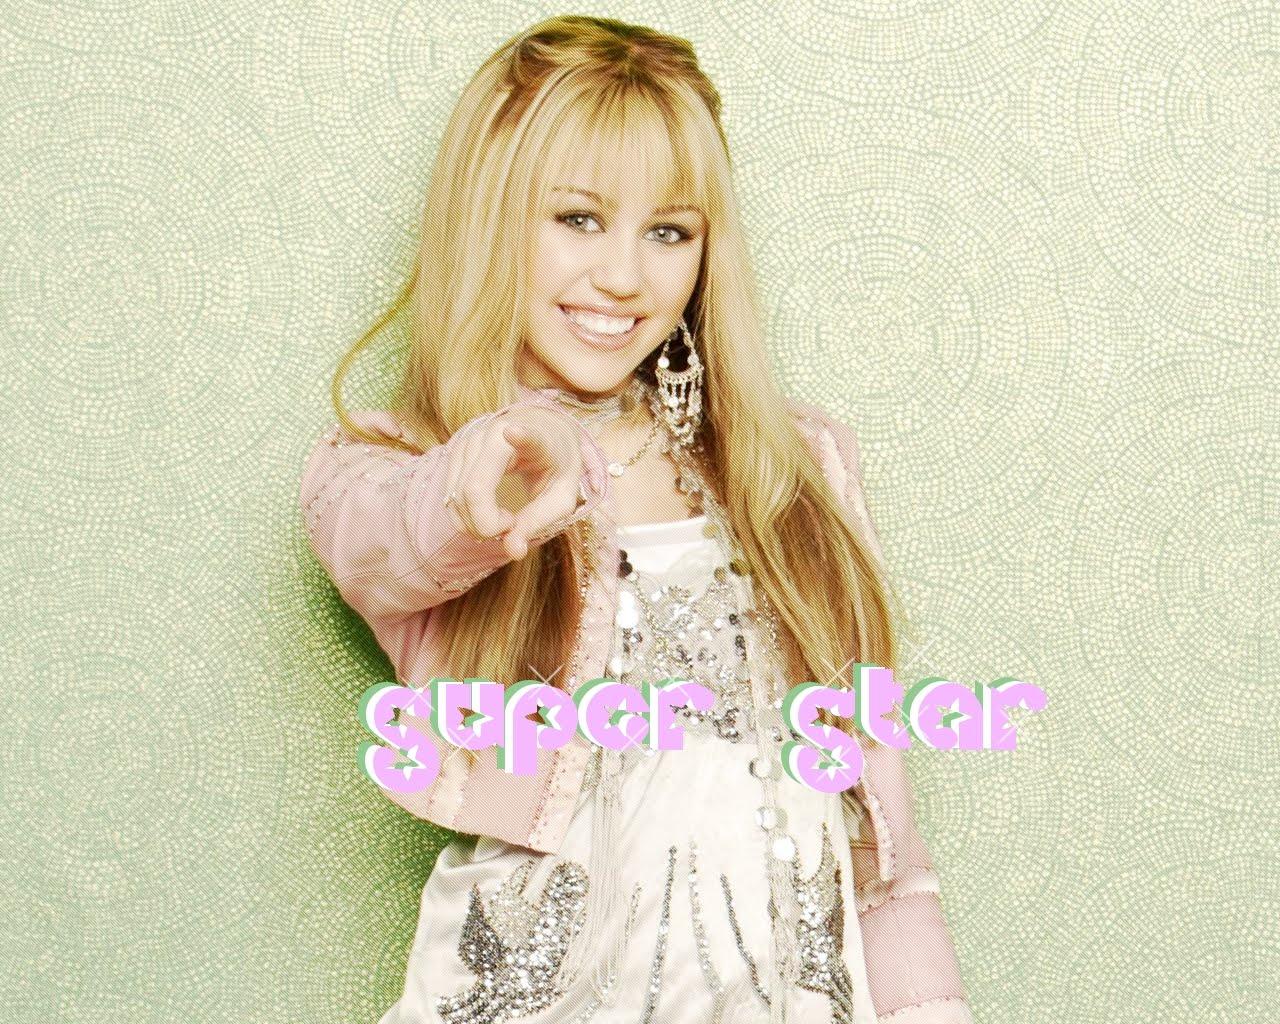 http://4.bp.blogspot.com/-2MwZ_hXEzD8/TeSU0WQko-I/AAAAAAAABj4/-a-z5_D8pnY/s1600/Miley%2BCyrus%2BWallpapers%2BLatest%2B2.jpg